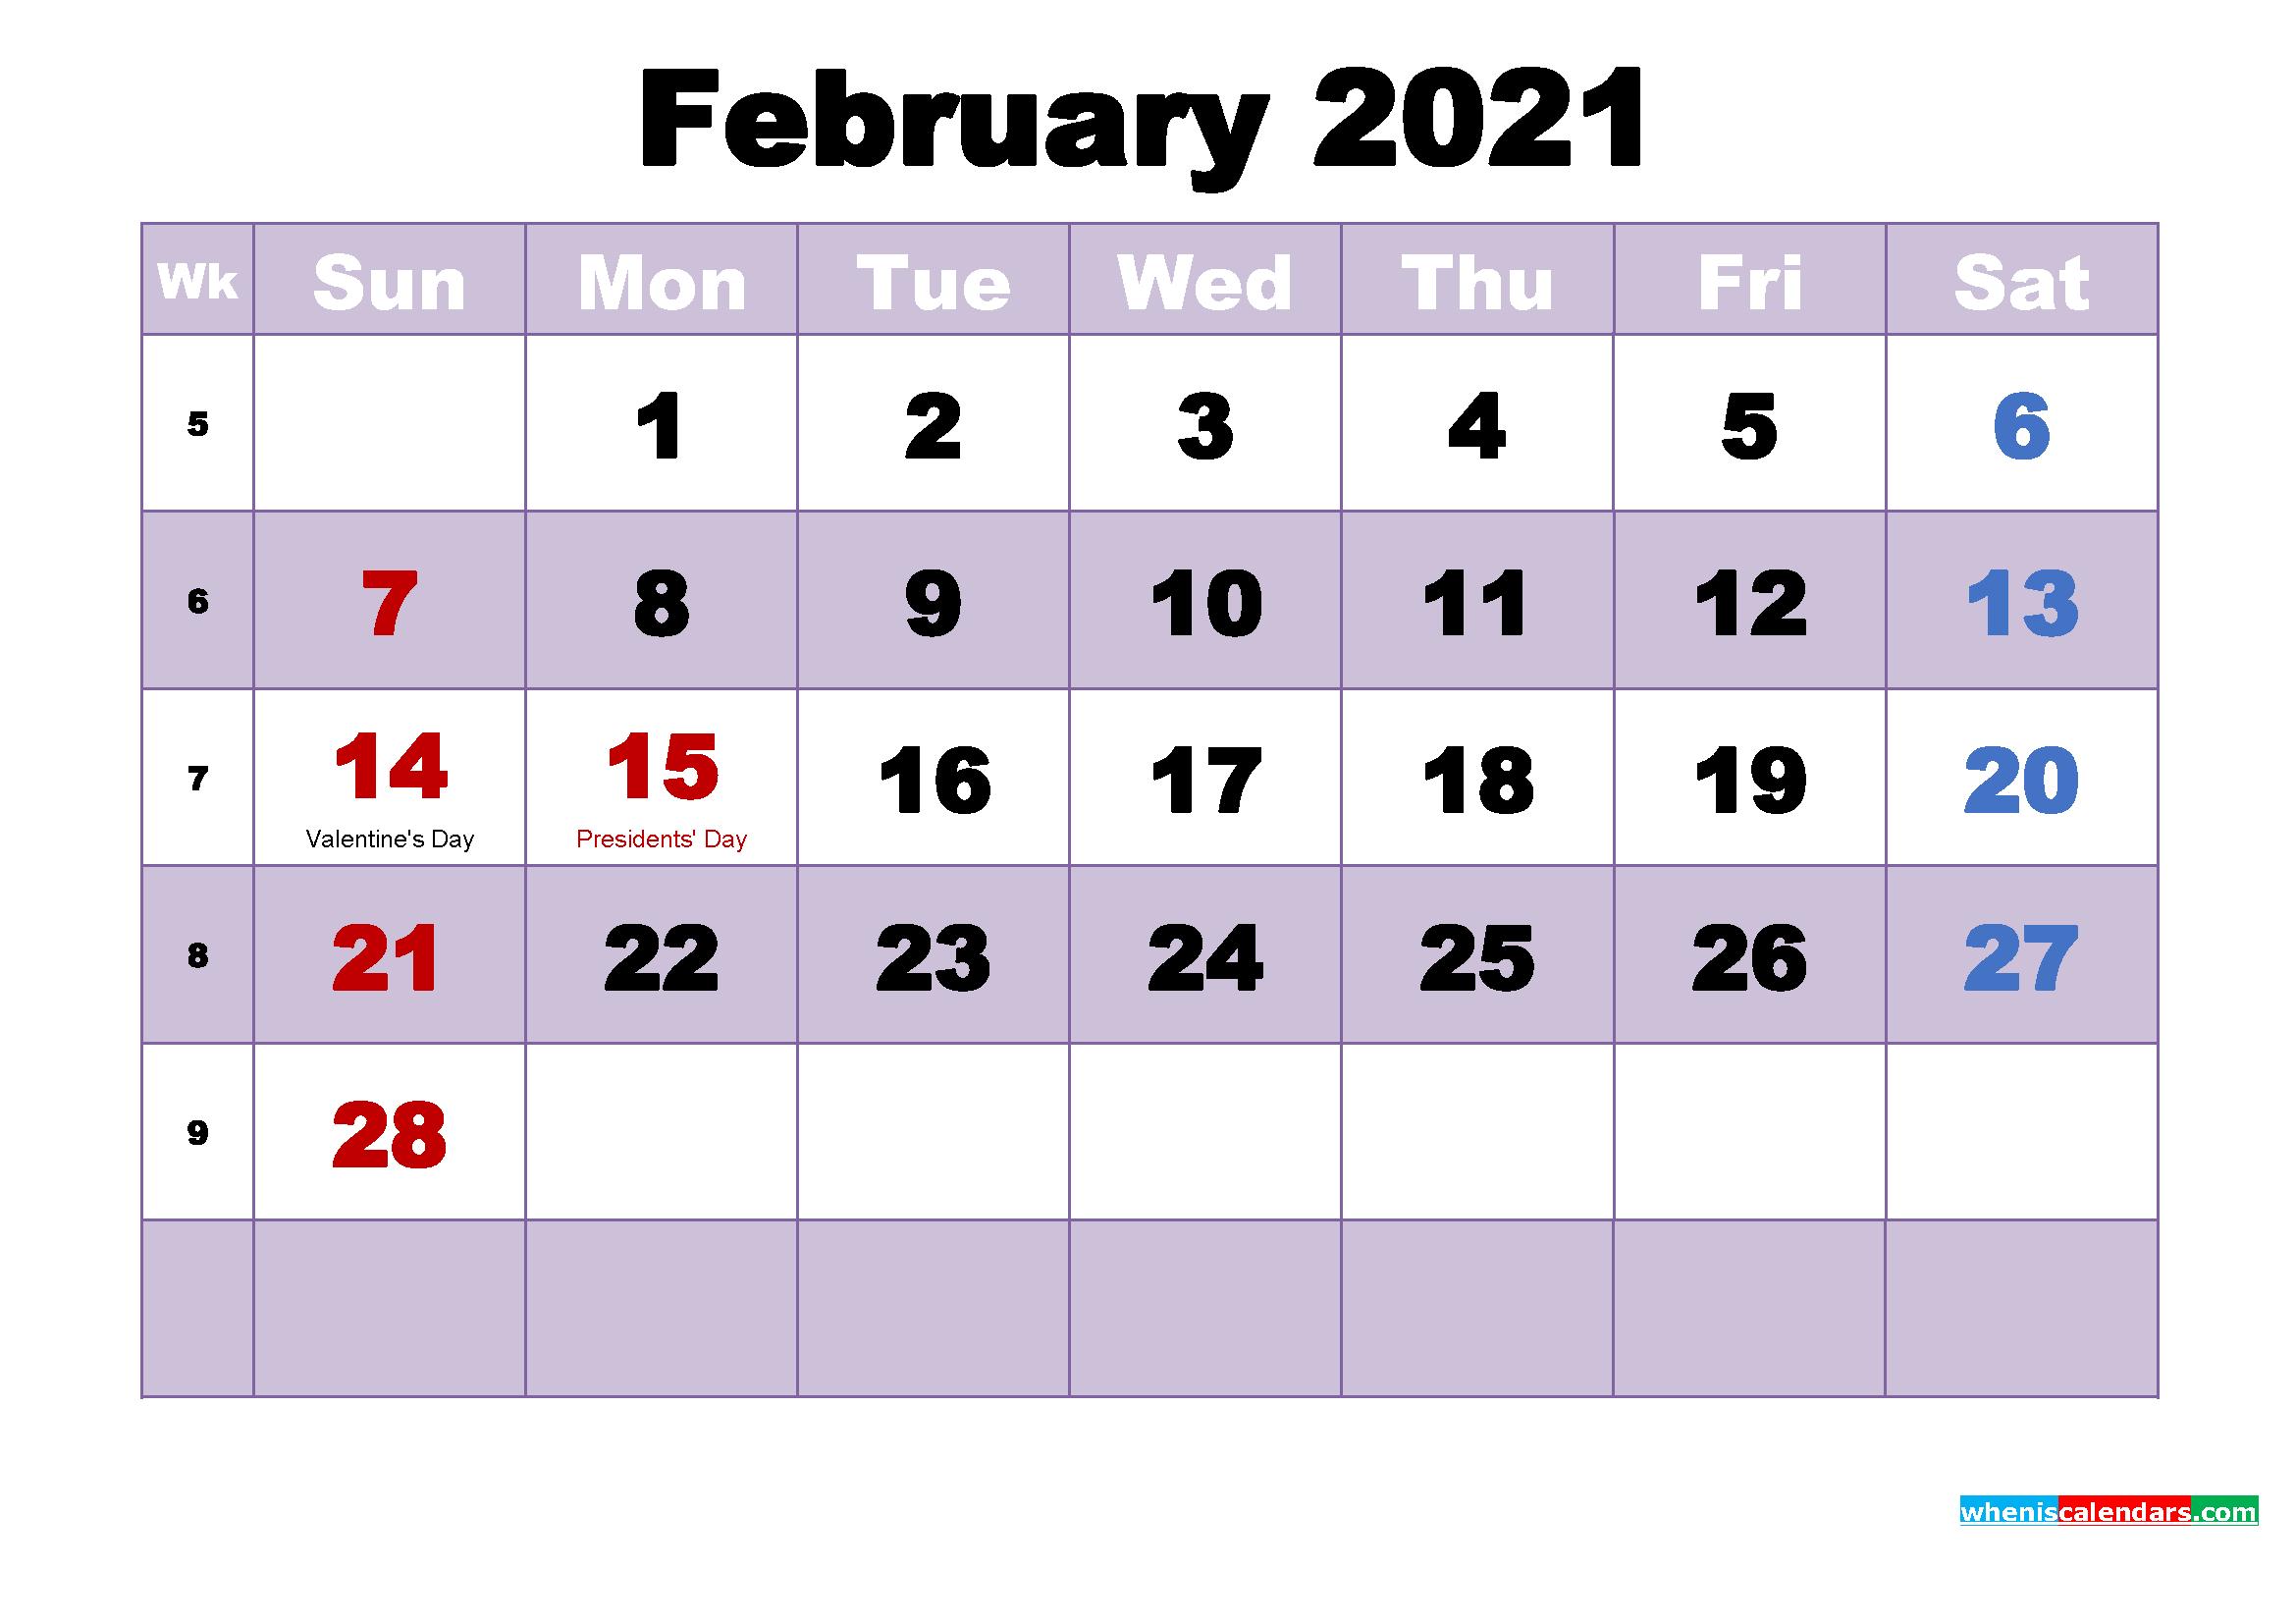 February 2021 Calendar Wallpaper Free Download